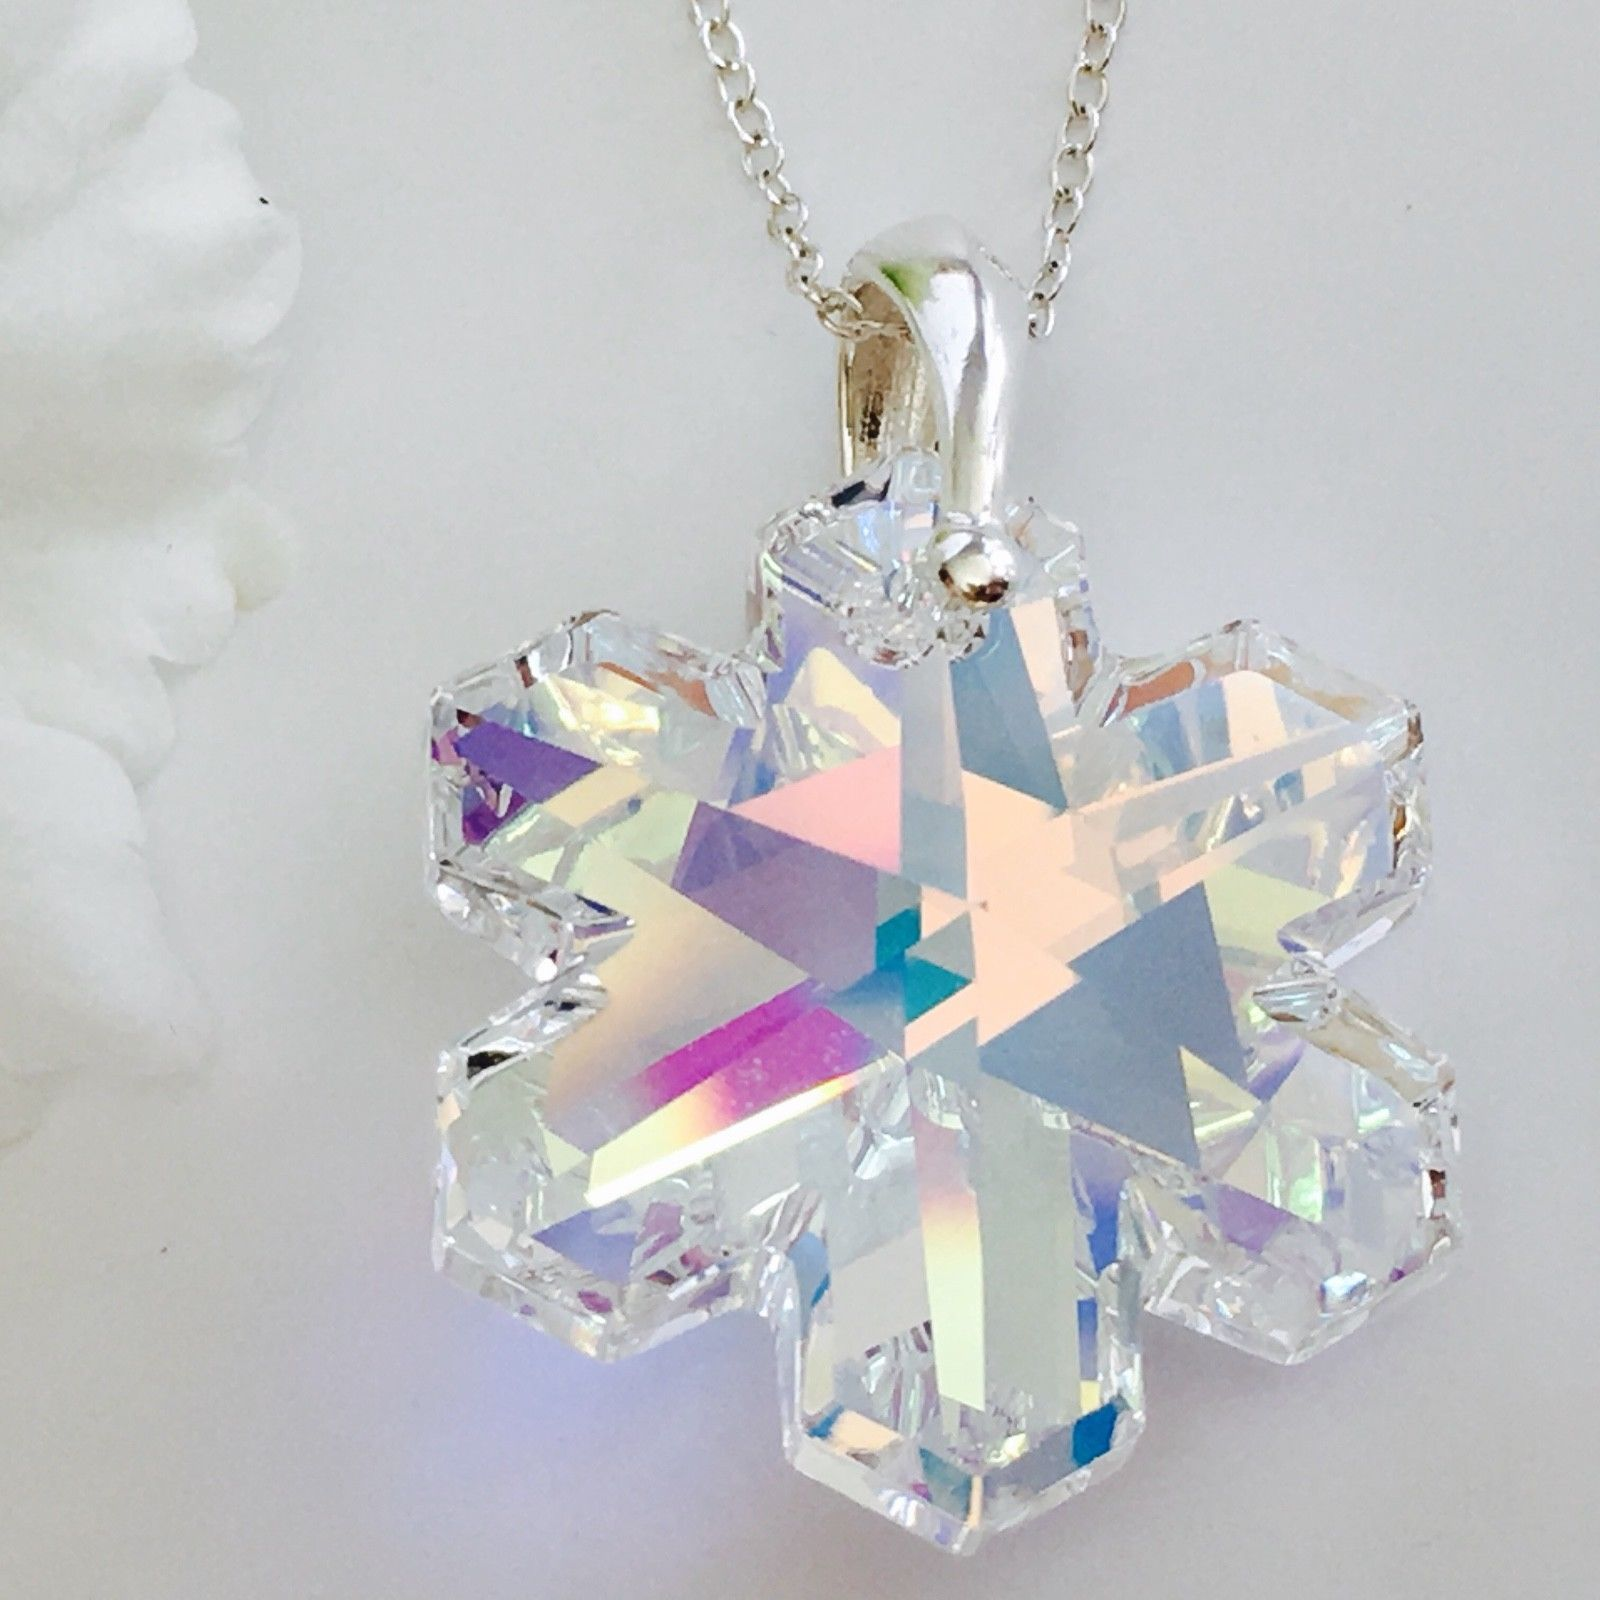 0cc5ce5442 Swarovski Elements AB Snowflake | Crystal Elegance